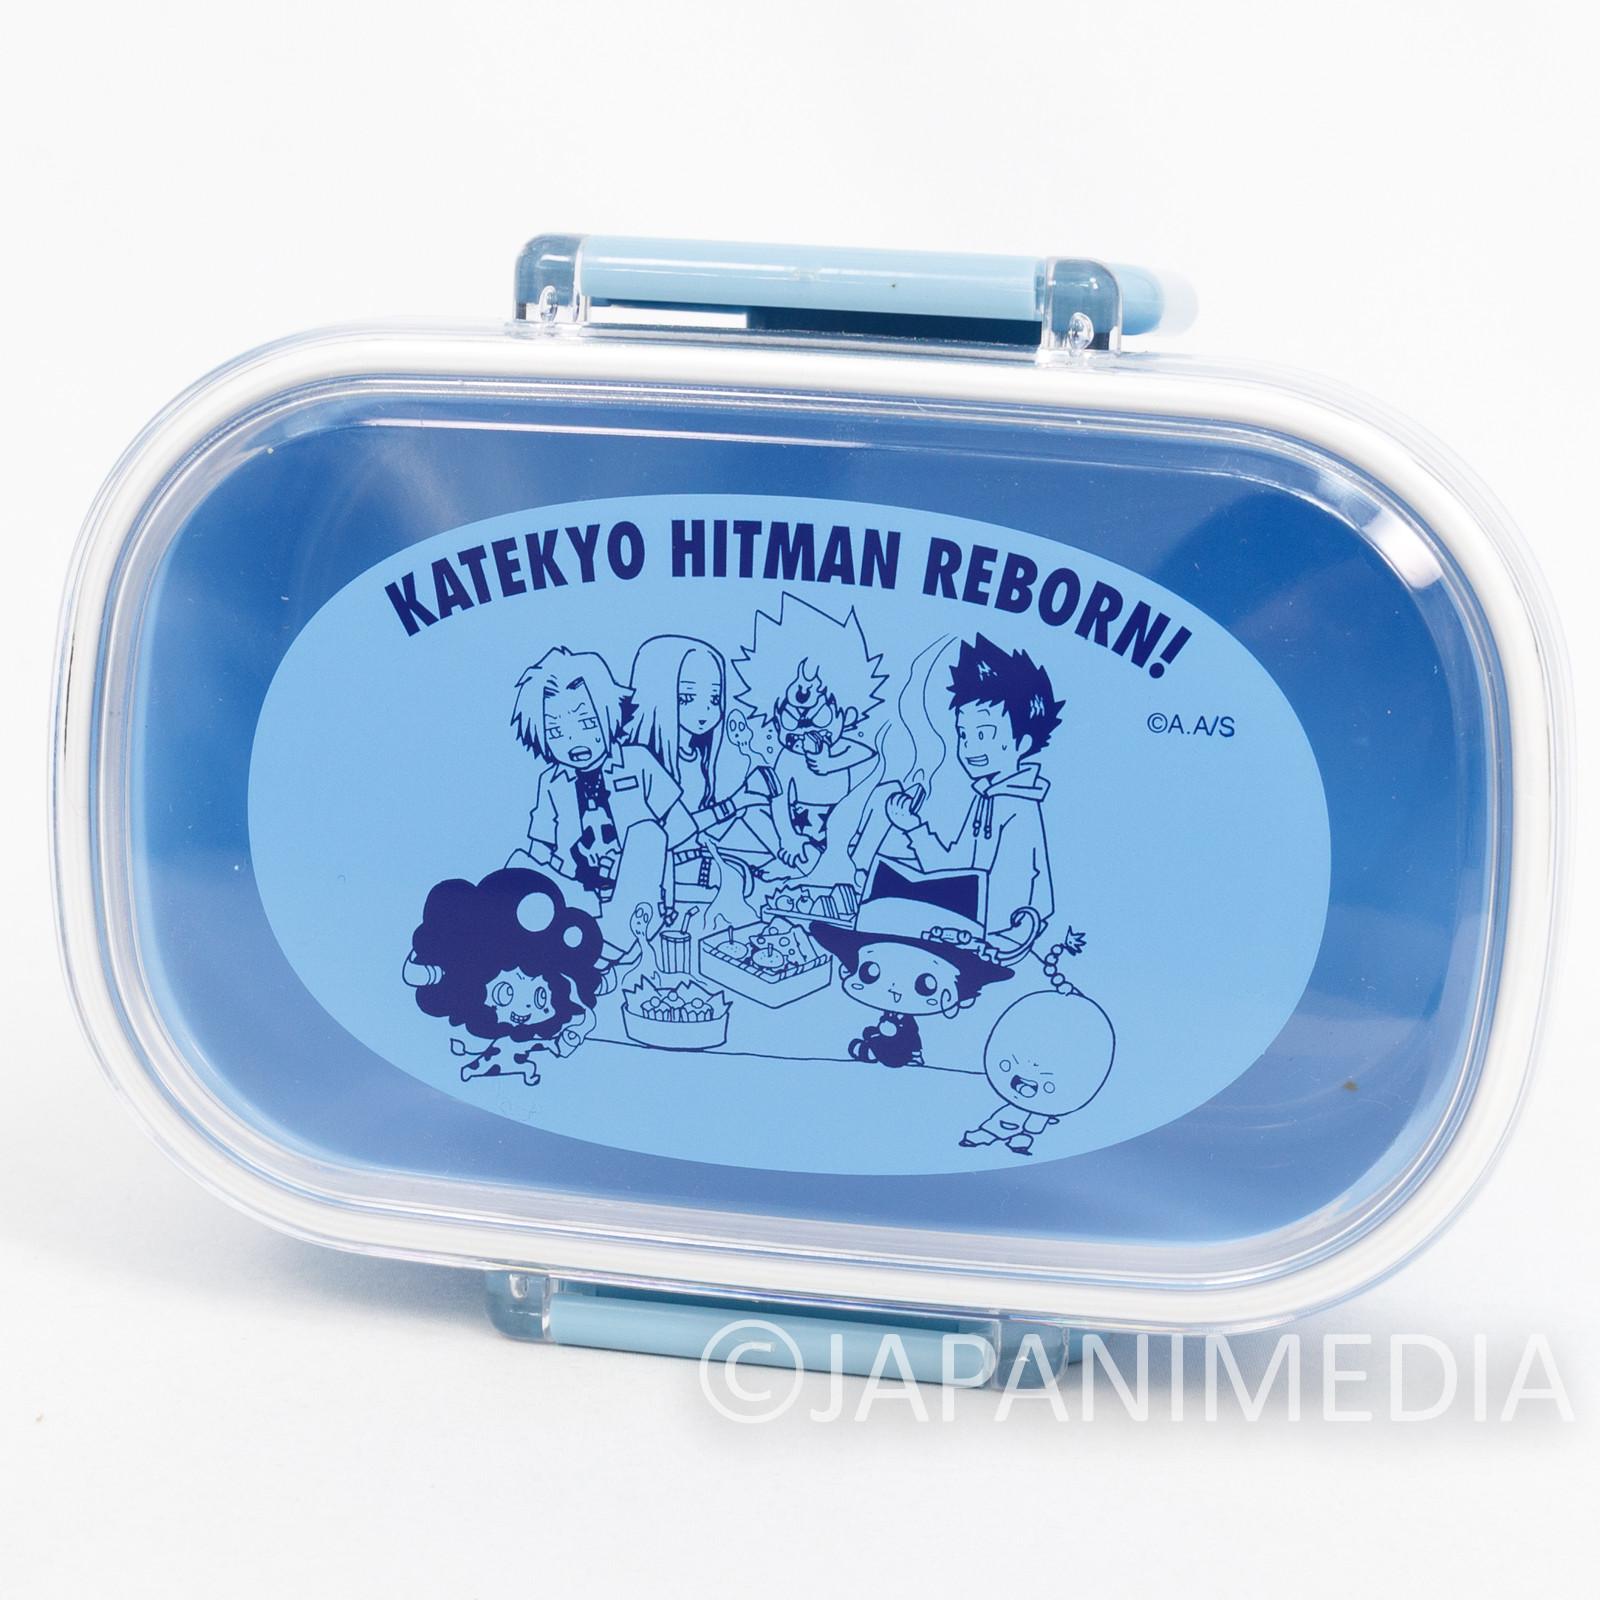 Katekyo Hitman REBORN! Lunch Box JAPAN ANIME MANGA SHONEN JUMP